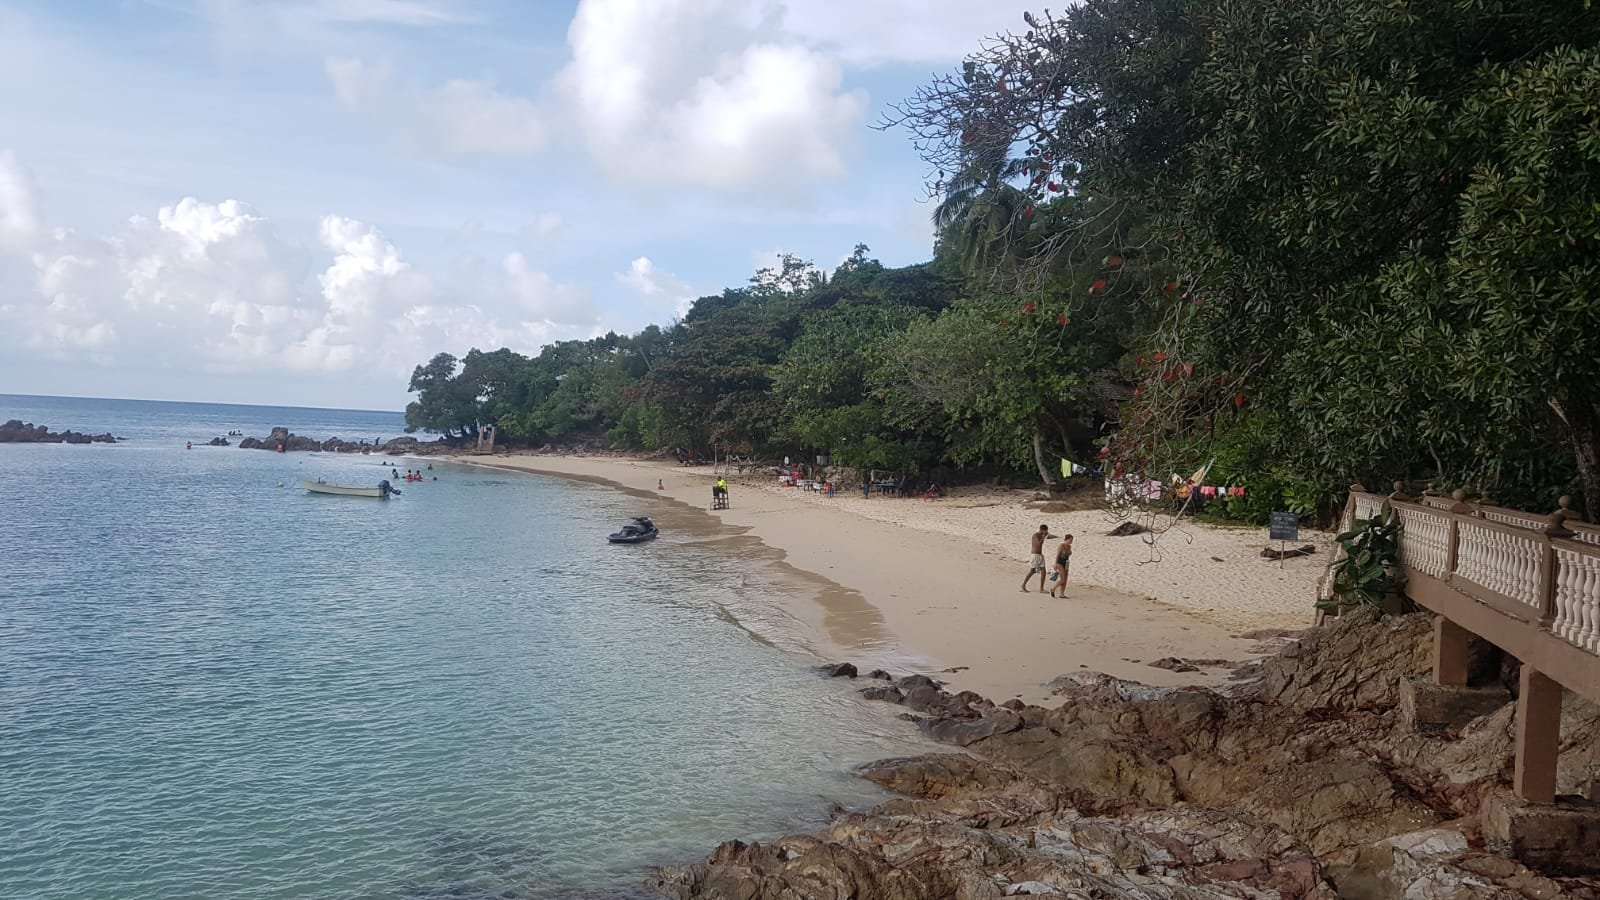 unser Privatstrand auf Pulau Kapas